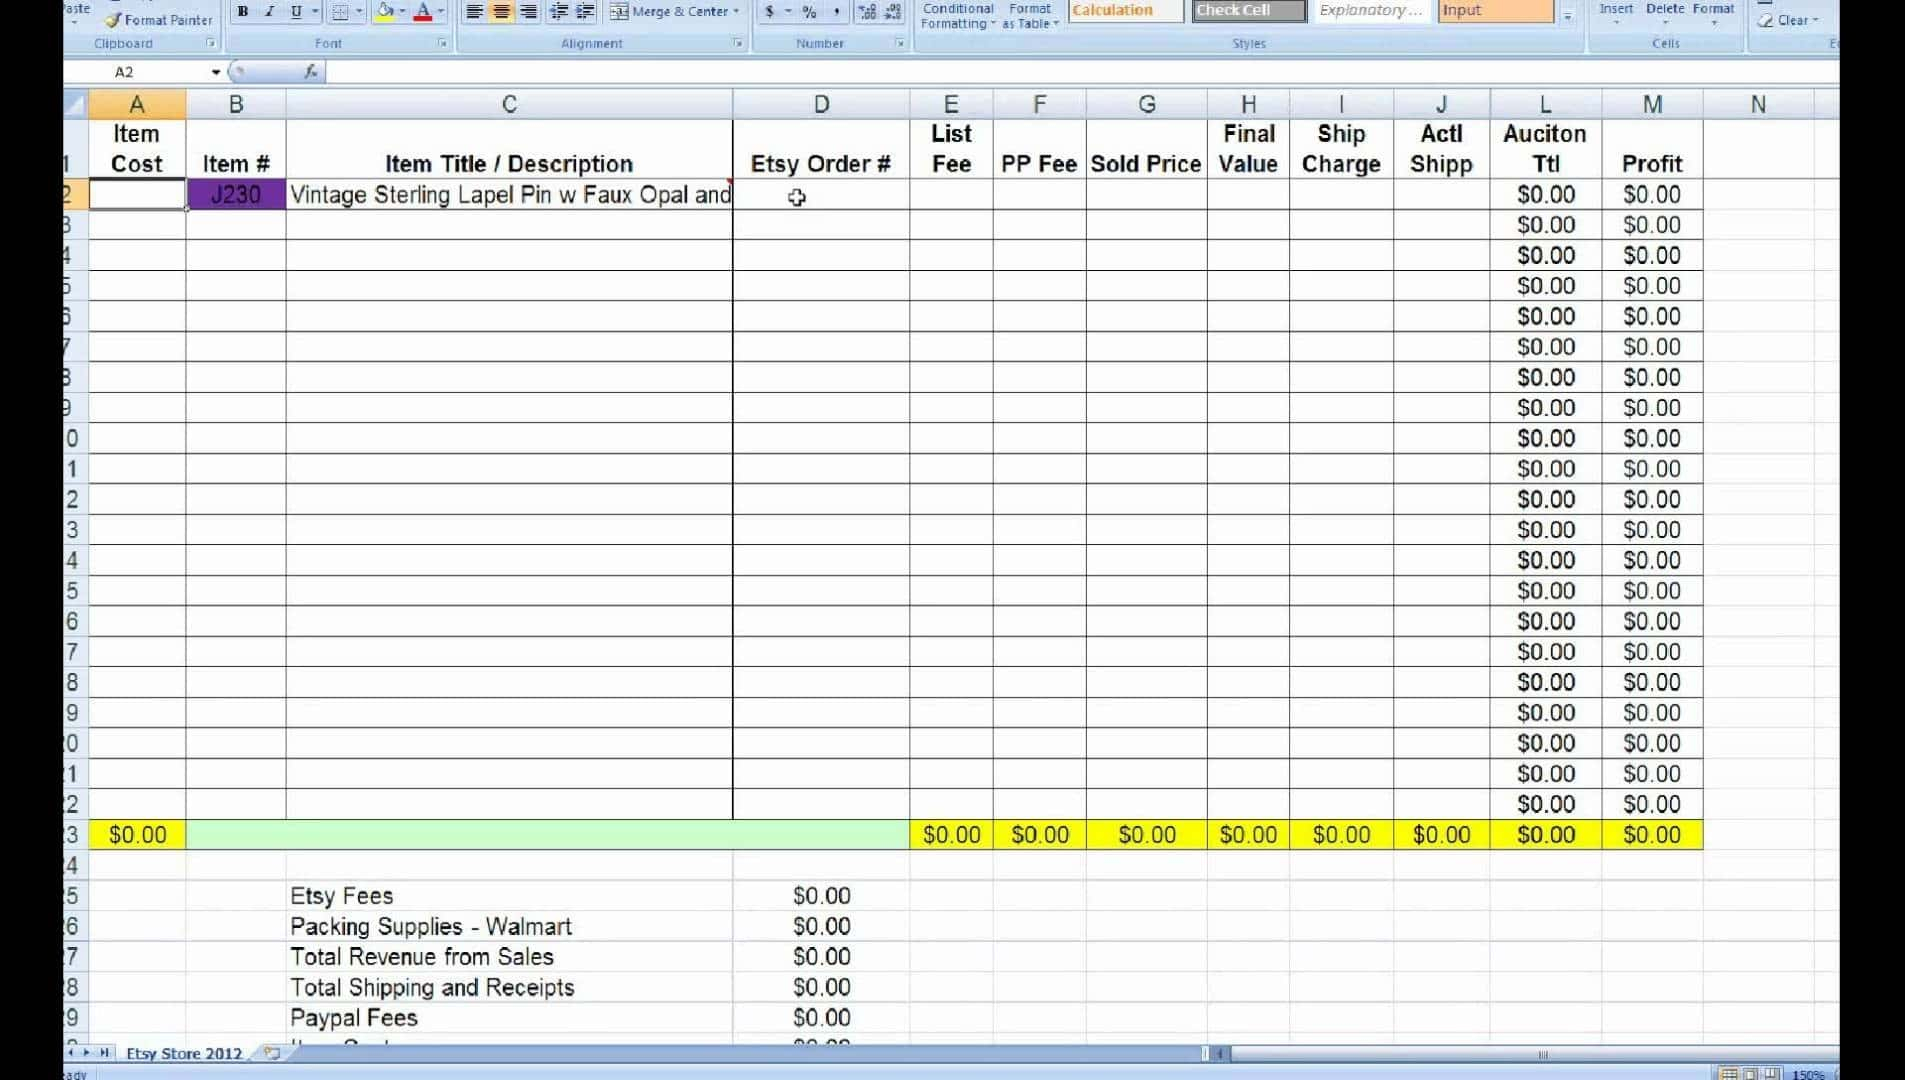 Boutique Inventory Spreadsheet | db-excel.com